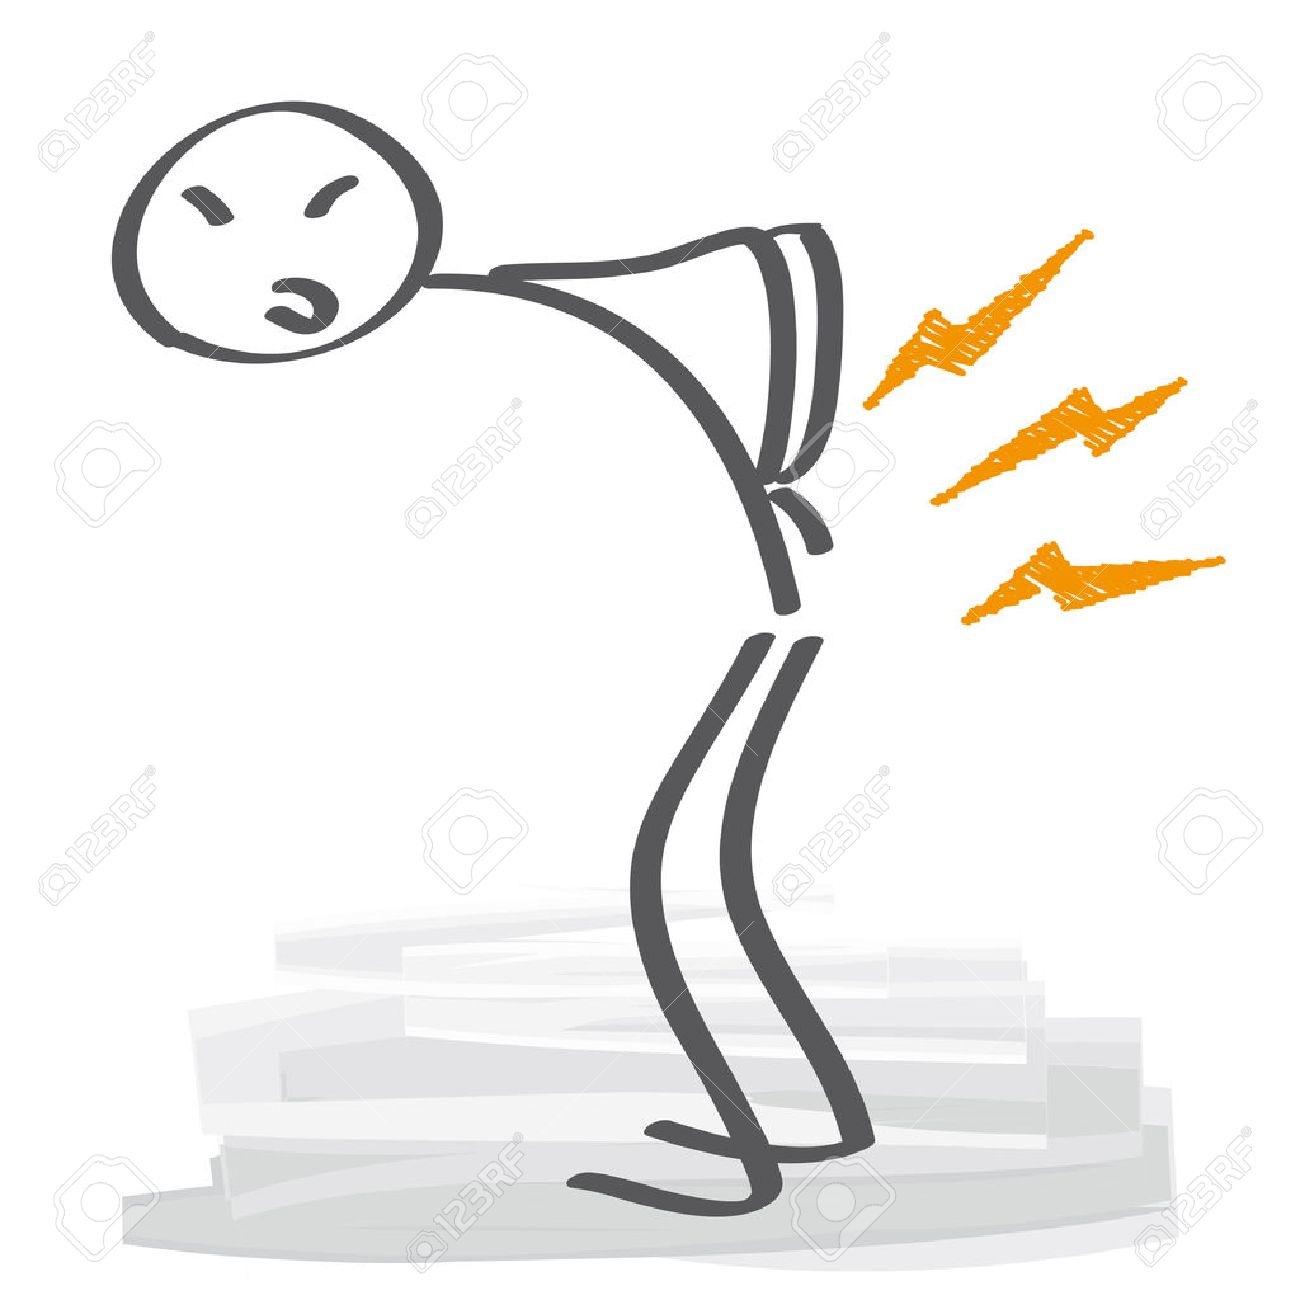 Low back pain - Stick figure has backache - 58943642